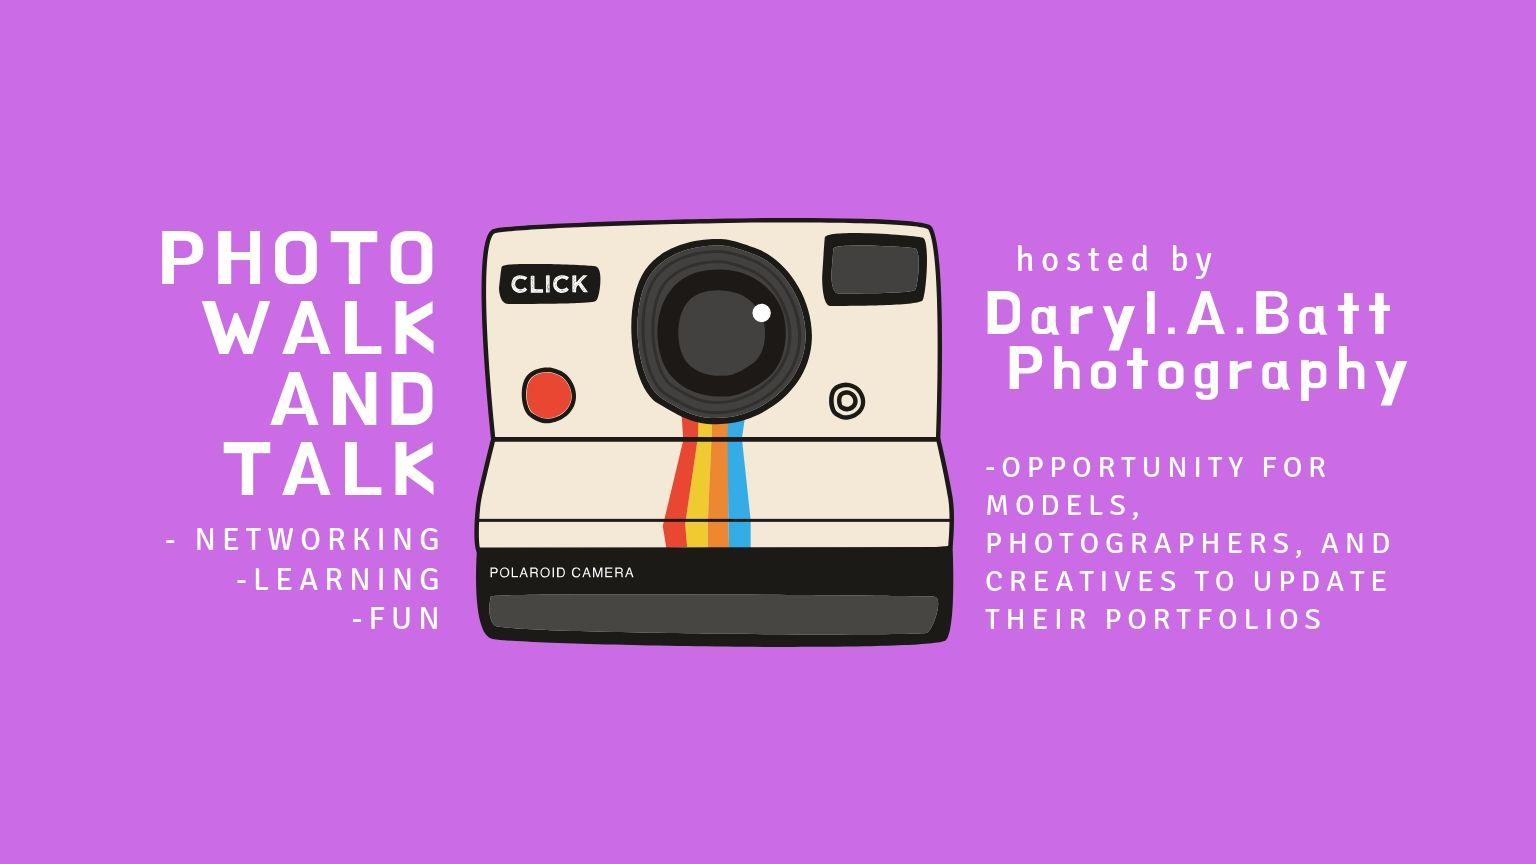 Copy of Photo Walk and talk.jpg